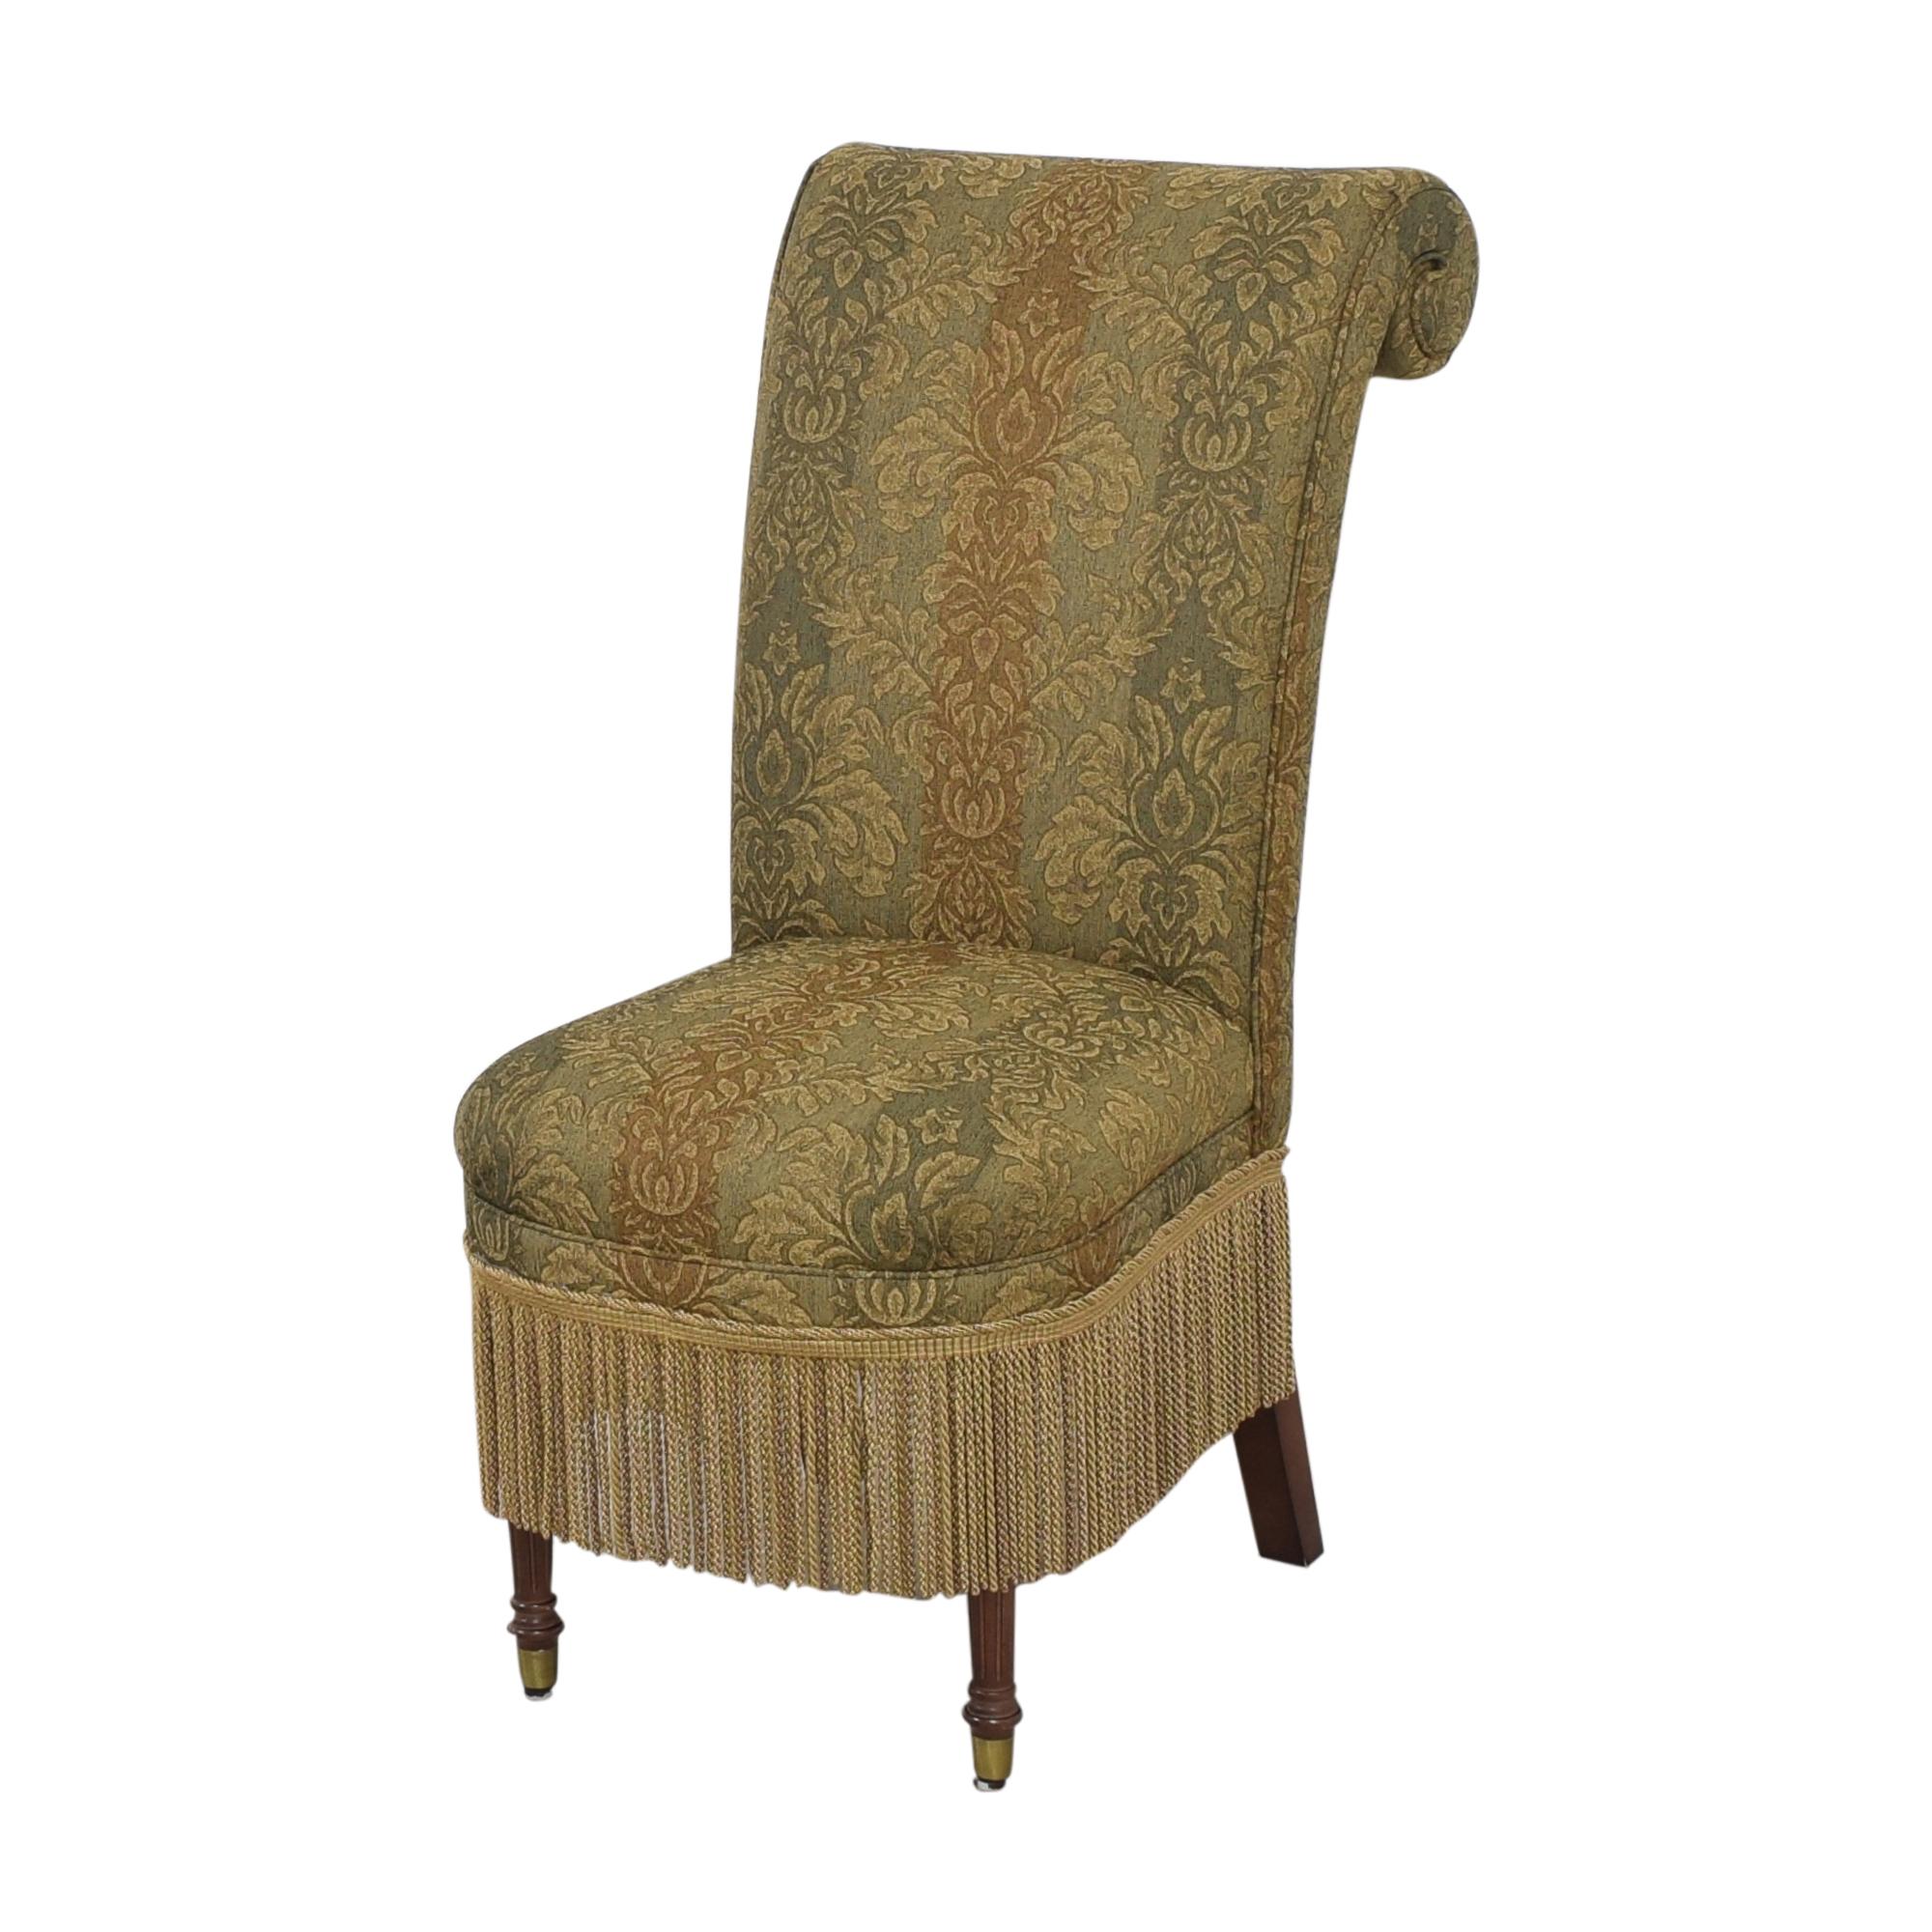 buy Designmaster Furniture Designmaster Furniture Tasseled Dining Chairs online